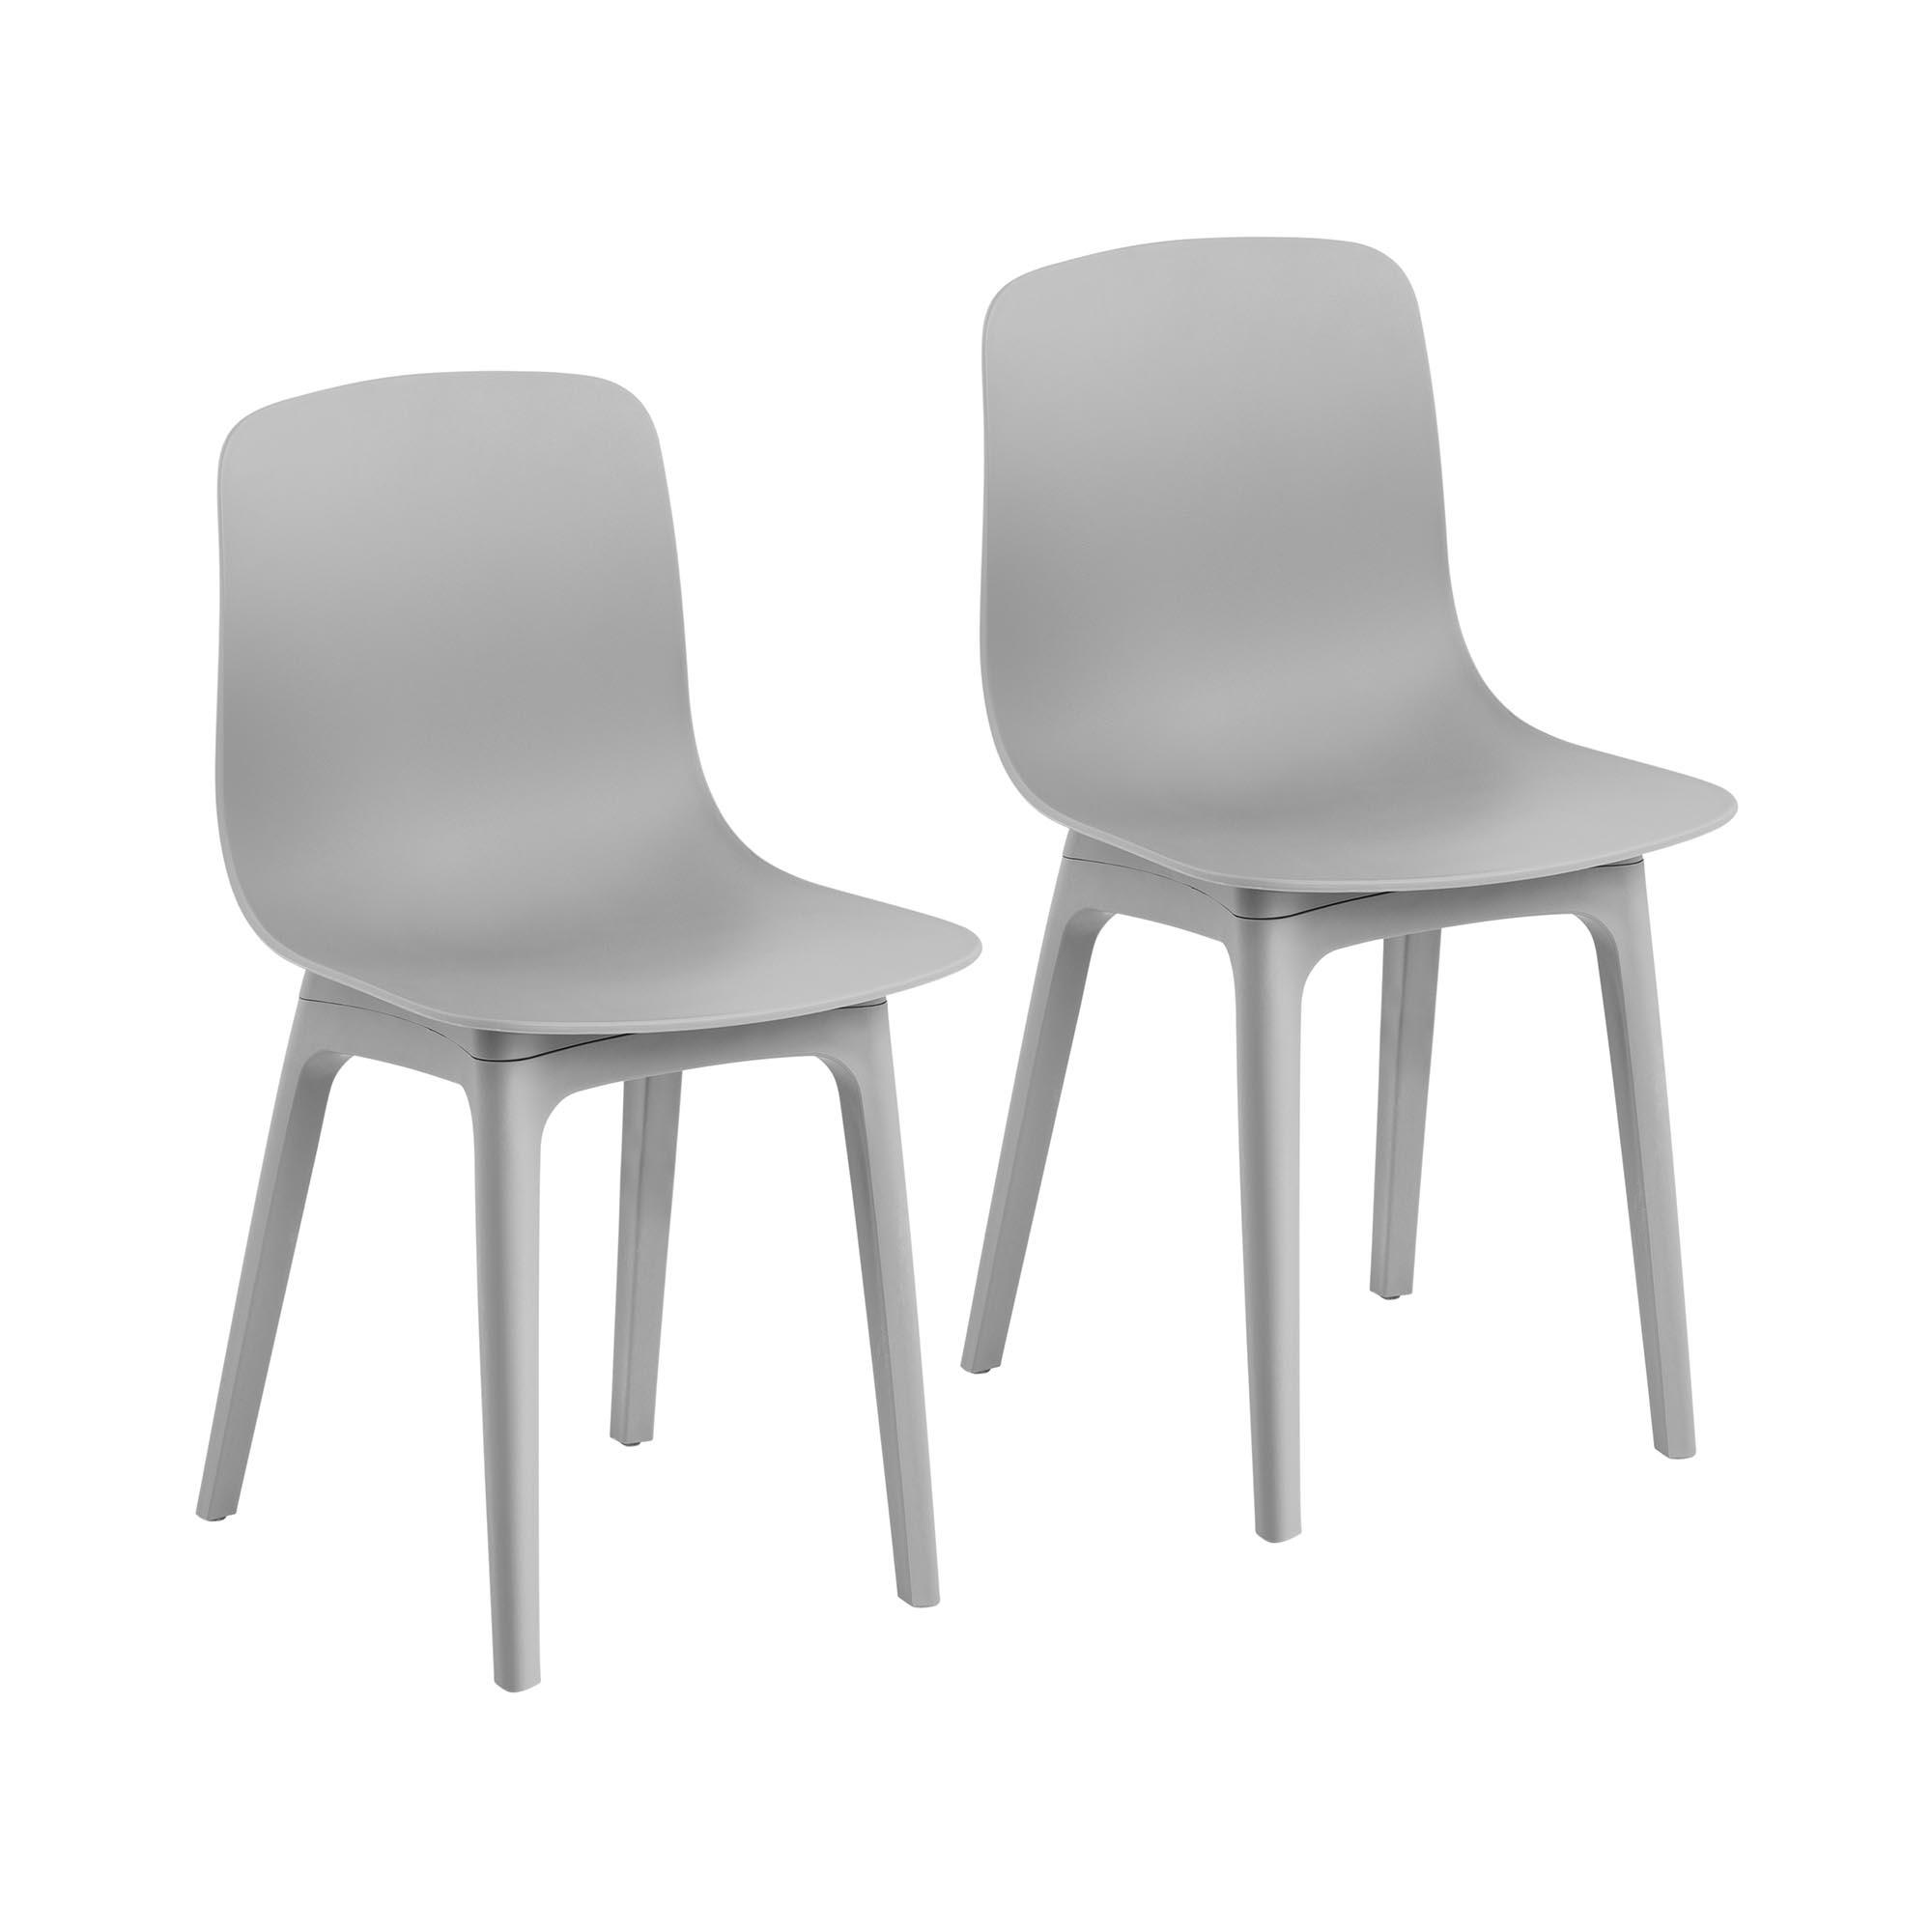 Fromm & Starck Stuhl - 2er Set - bis 150 kg - Sitzfläche 44 x 41 cm - grau STAR_SEAT_06